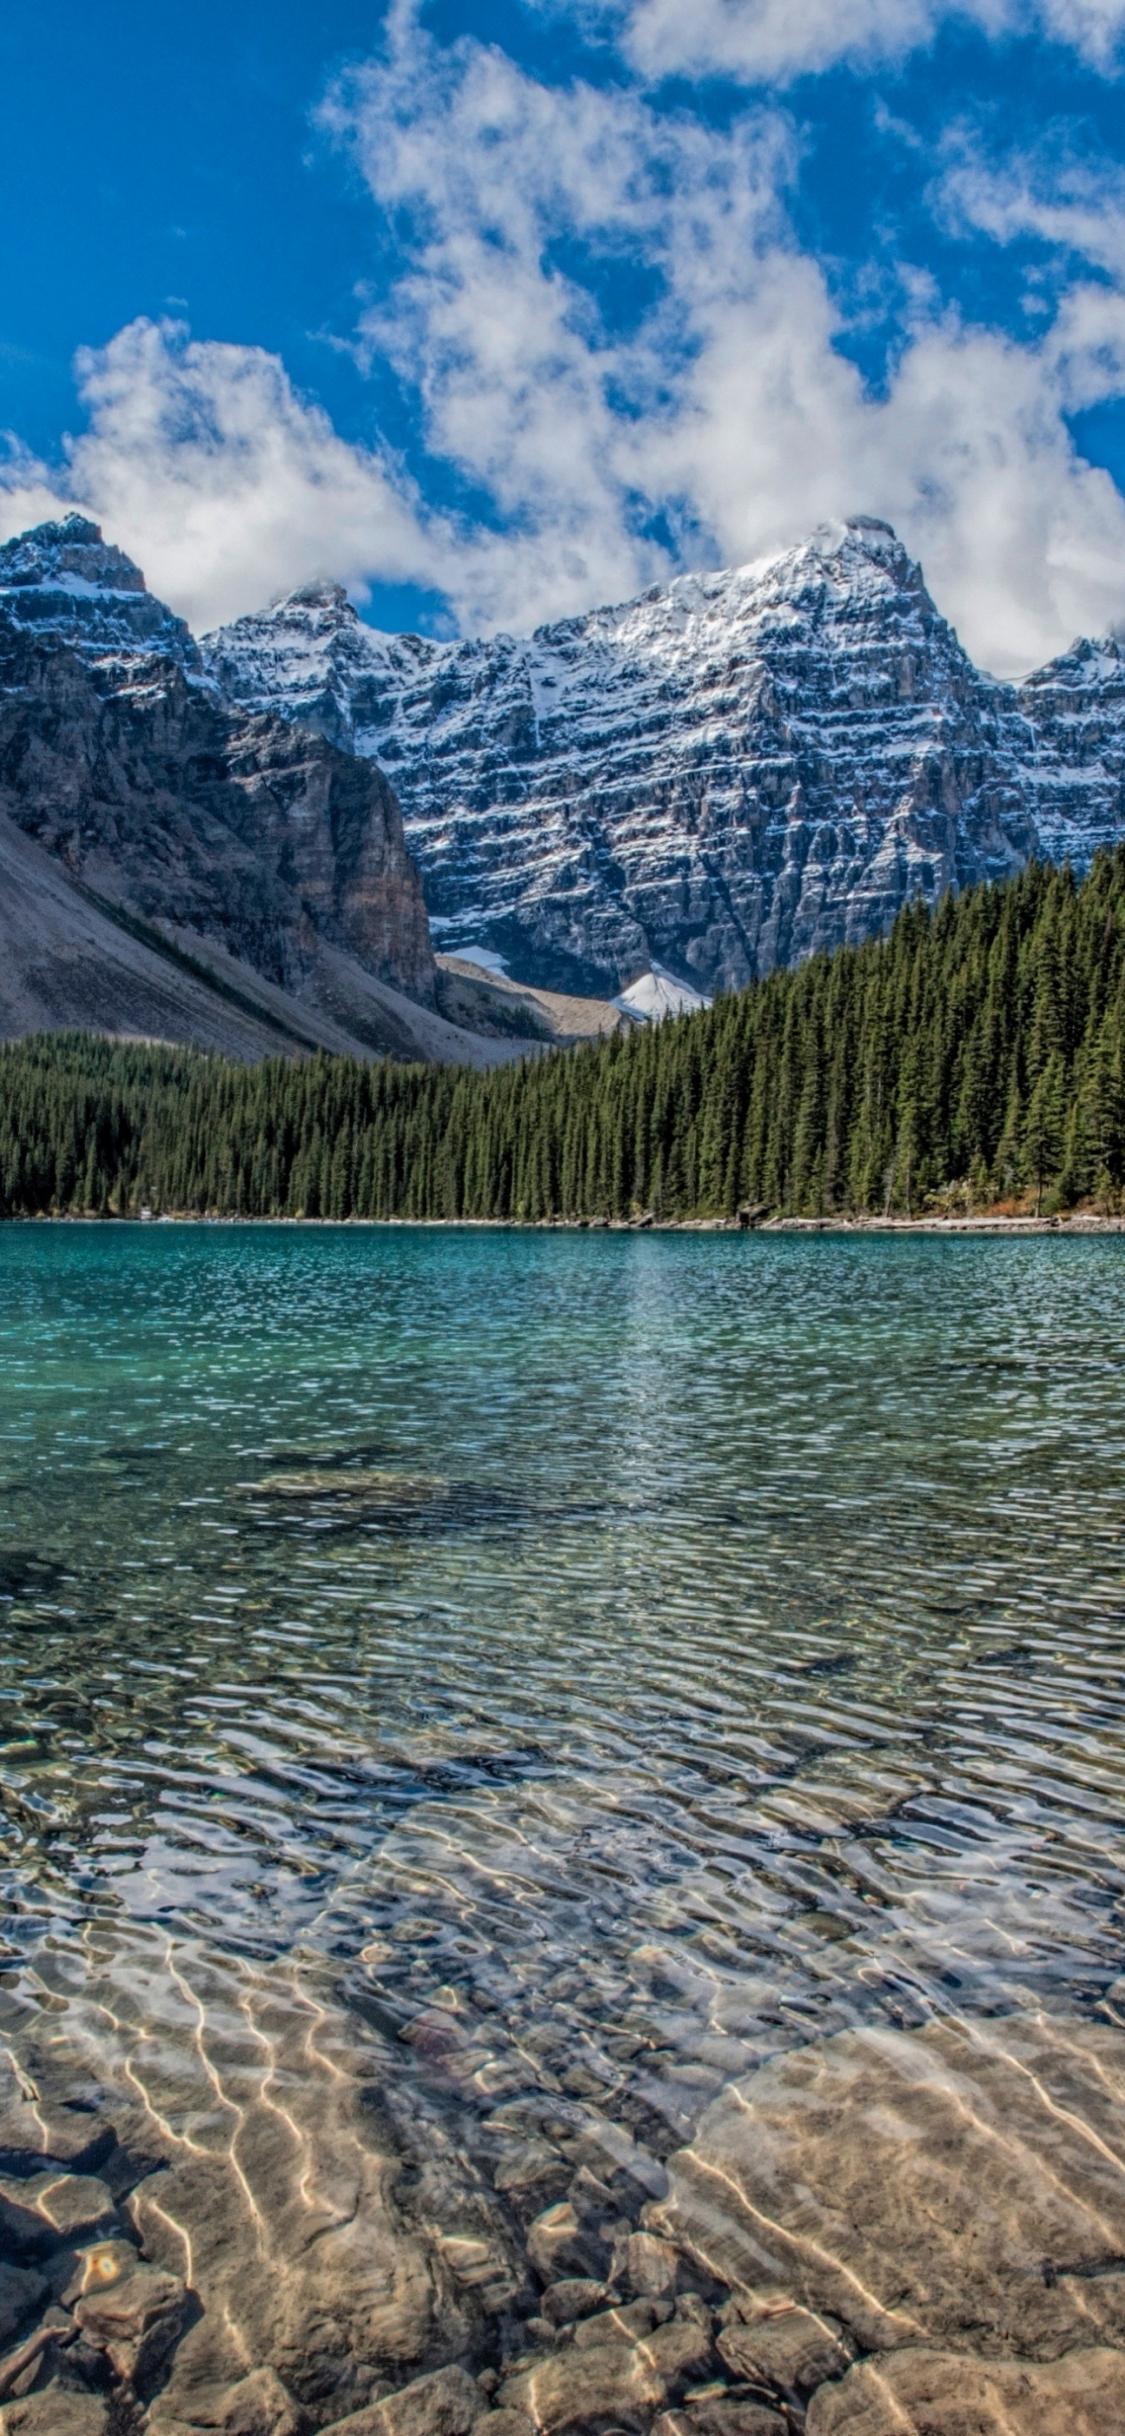 Samsung Galaxy S7 Edge Fall Wallpaper Download 1125x2436 Wallpaper Clean Lake Mountains Range